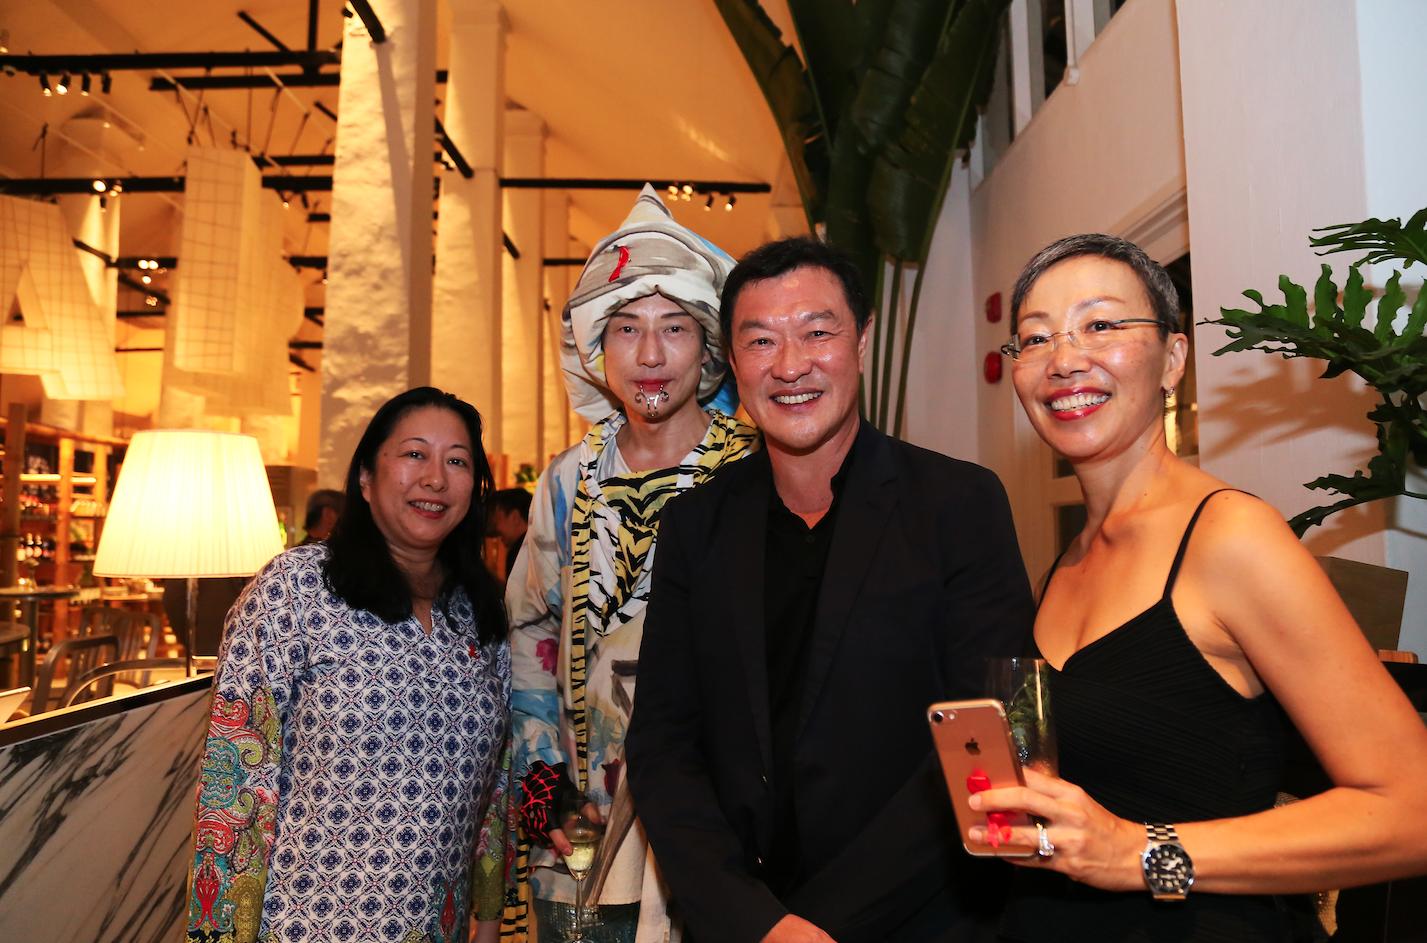 Kathryn Khoo, Ritz Lim, Goh Eck Meng, Natasha Foong